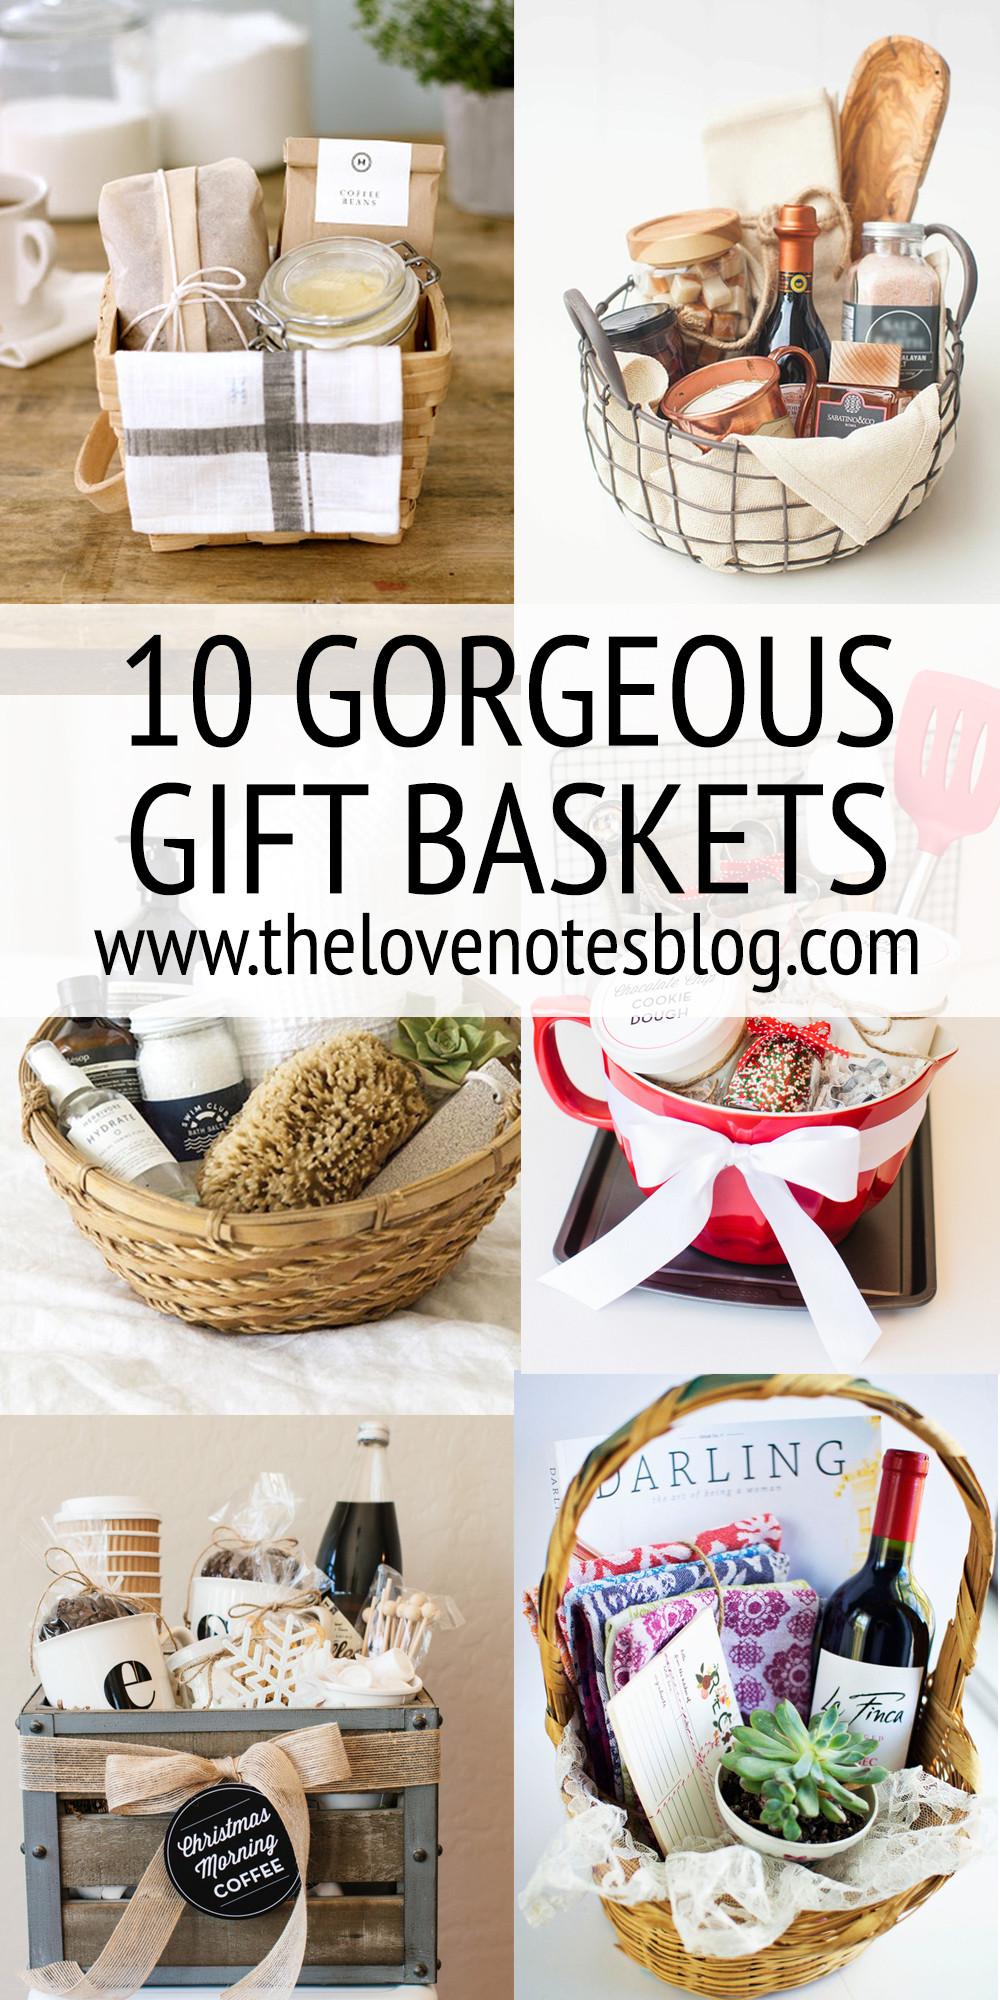 Christmas Food Gifts 2019  Mason Jar Gift Ideas – The Love Notes Blog